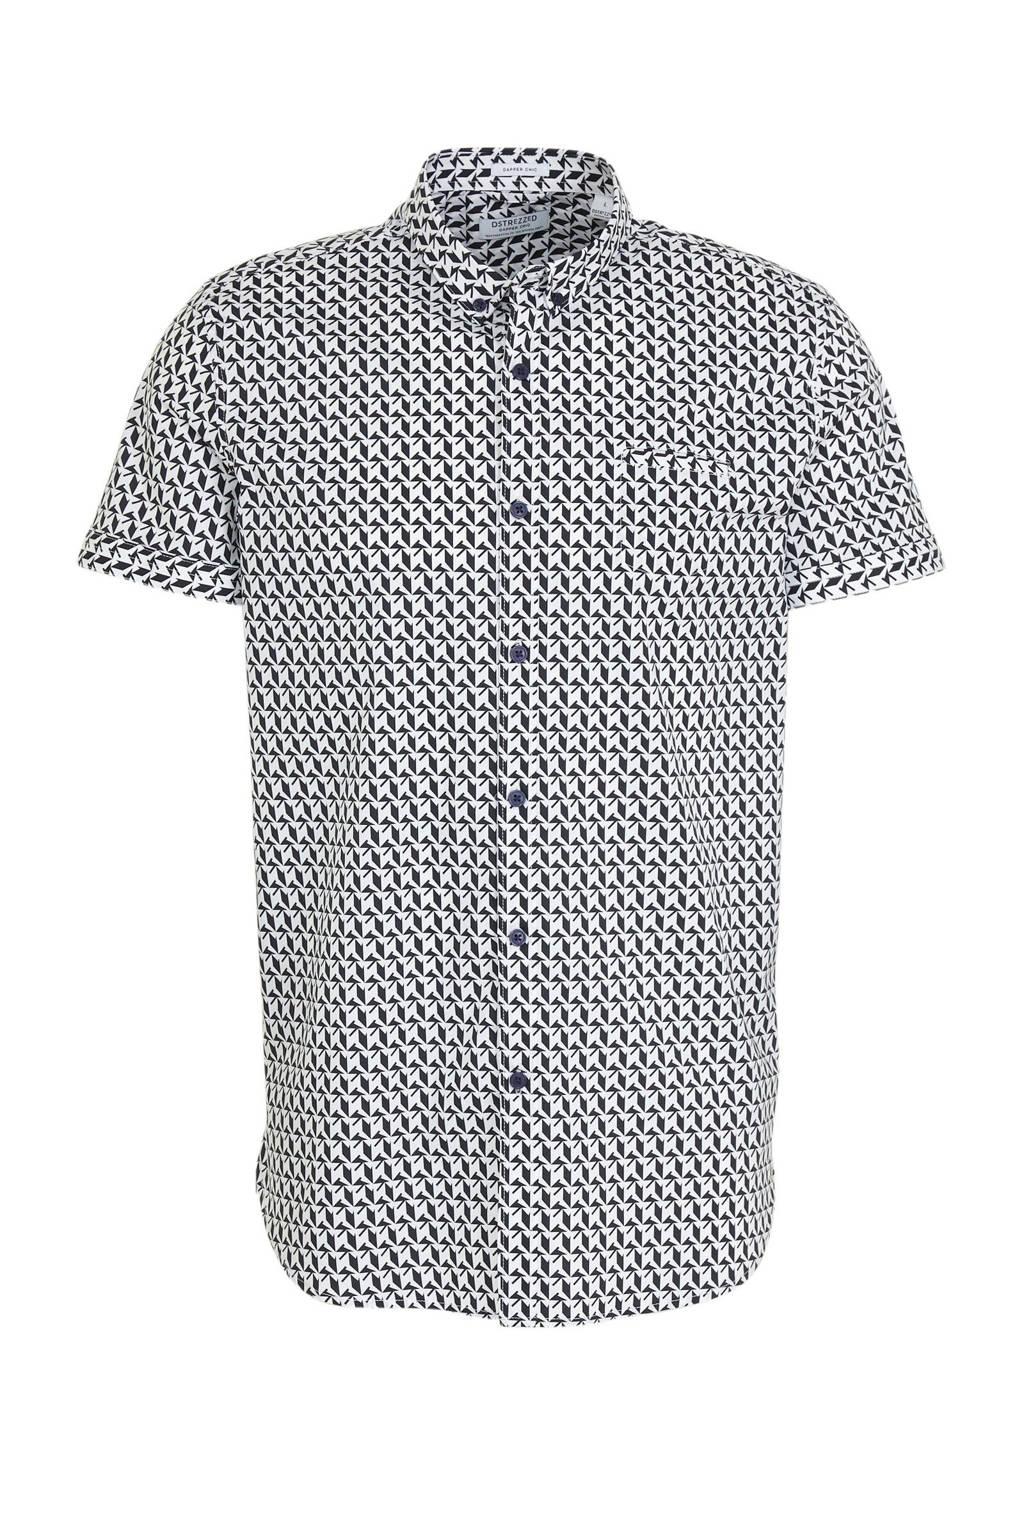 Dstrezzed regular fit overhemd met all over print wit/zwart, Wit/zwart